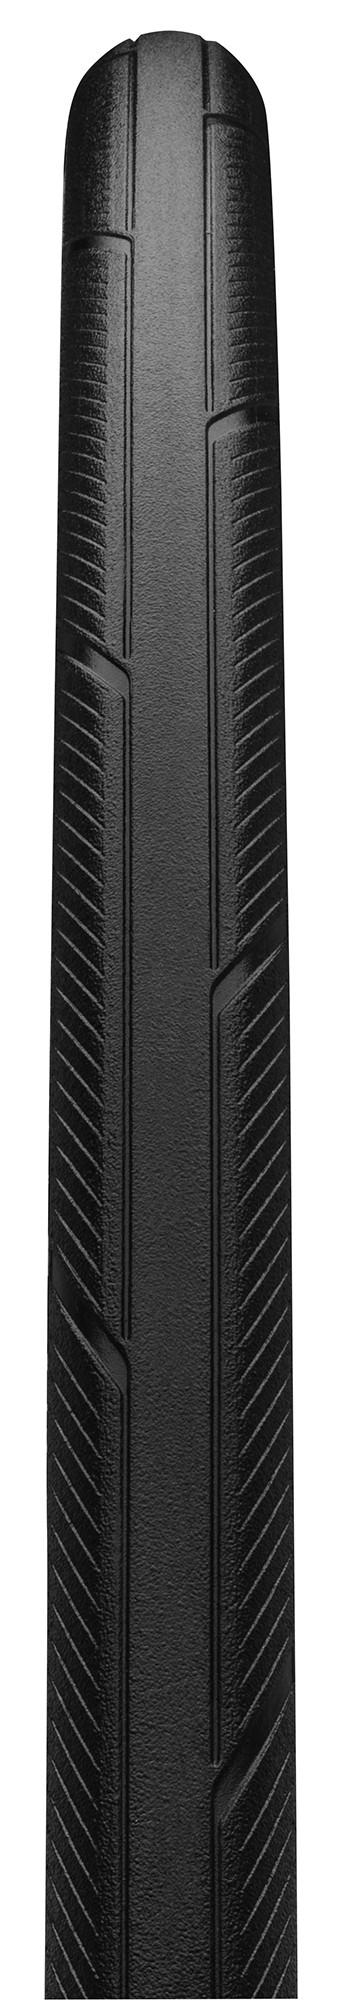 Anvelopa pliabila Continental UltraSport III 25-622 negru/albastru - Wheelsports